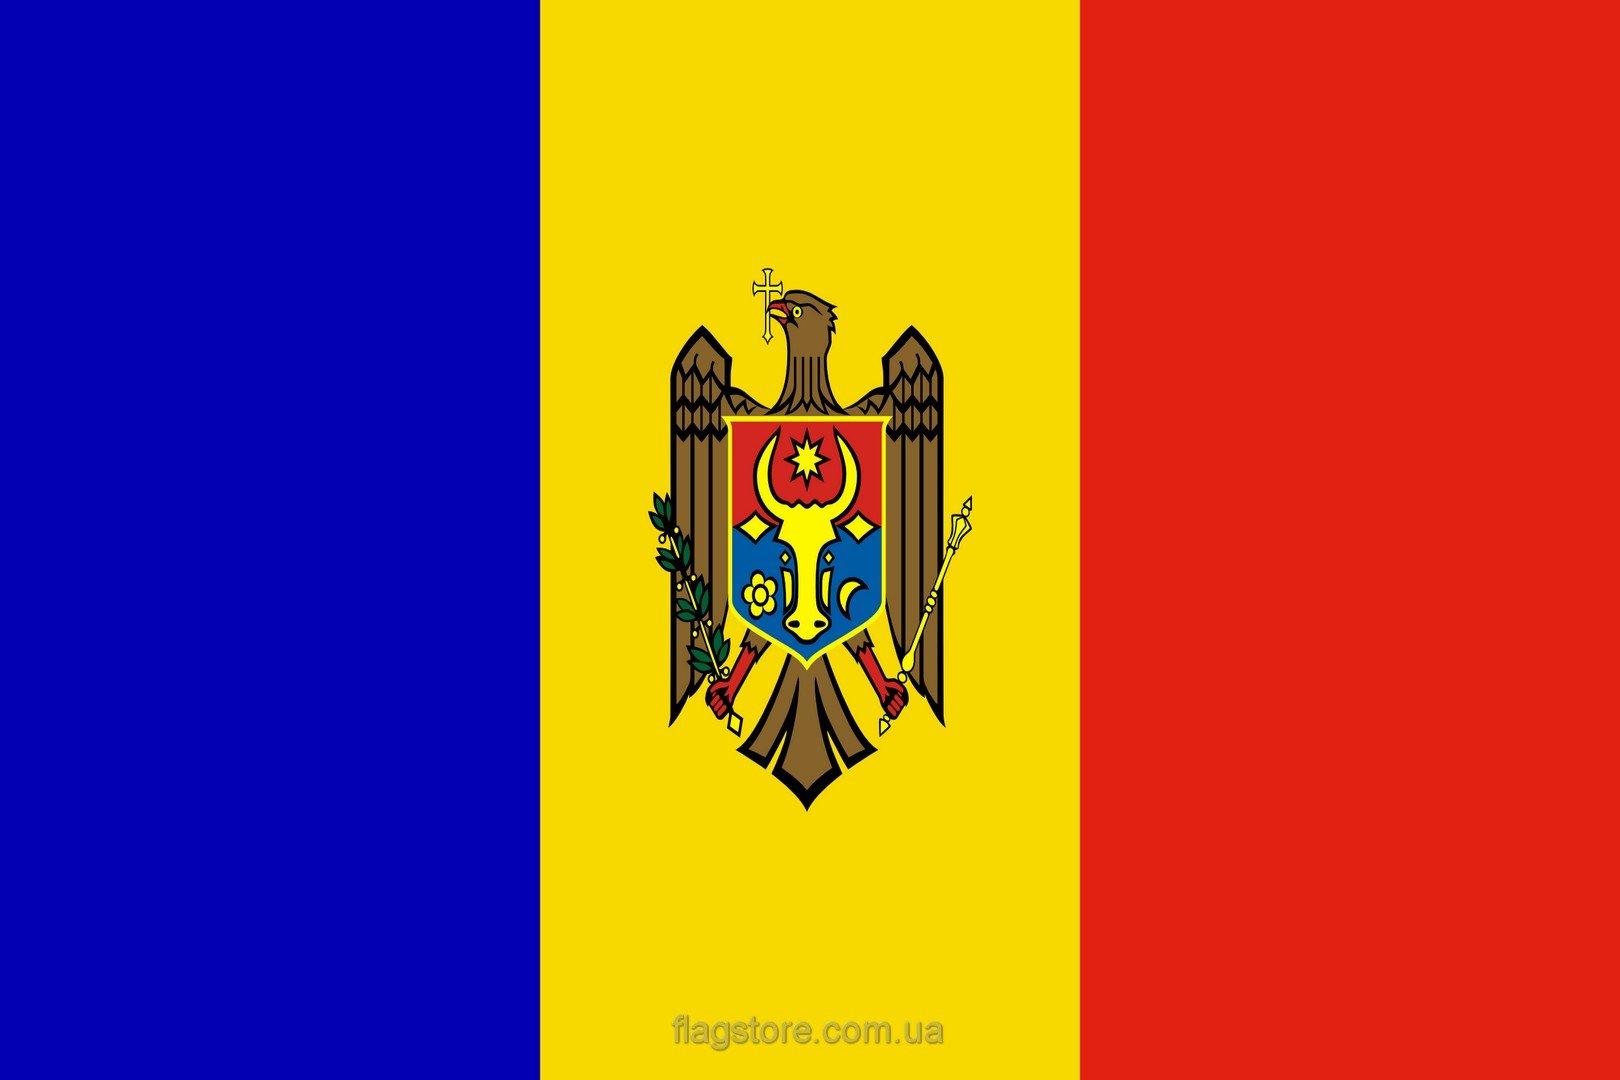 Купить флаг Молдавии (страны Молдавия)